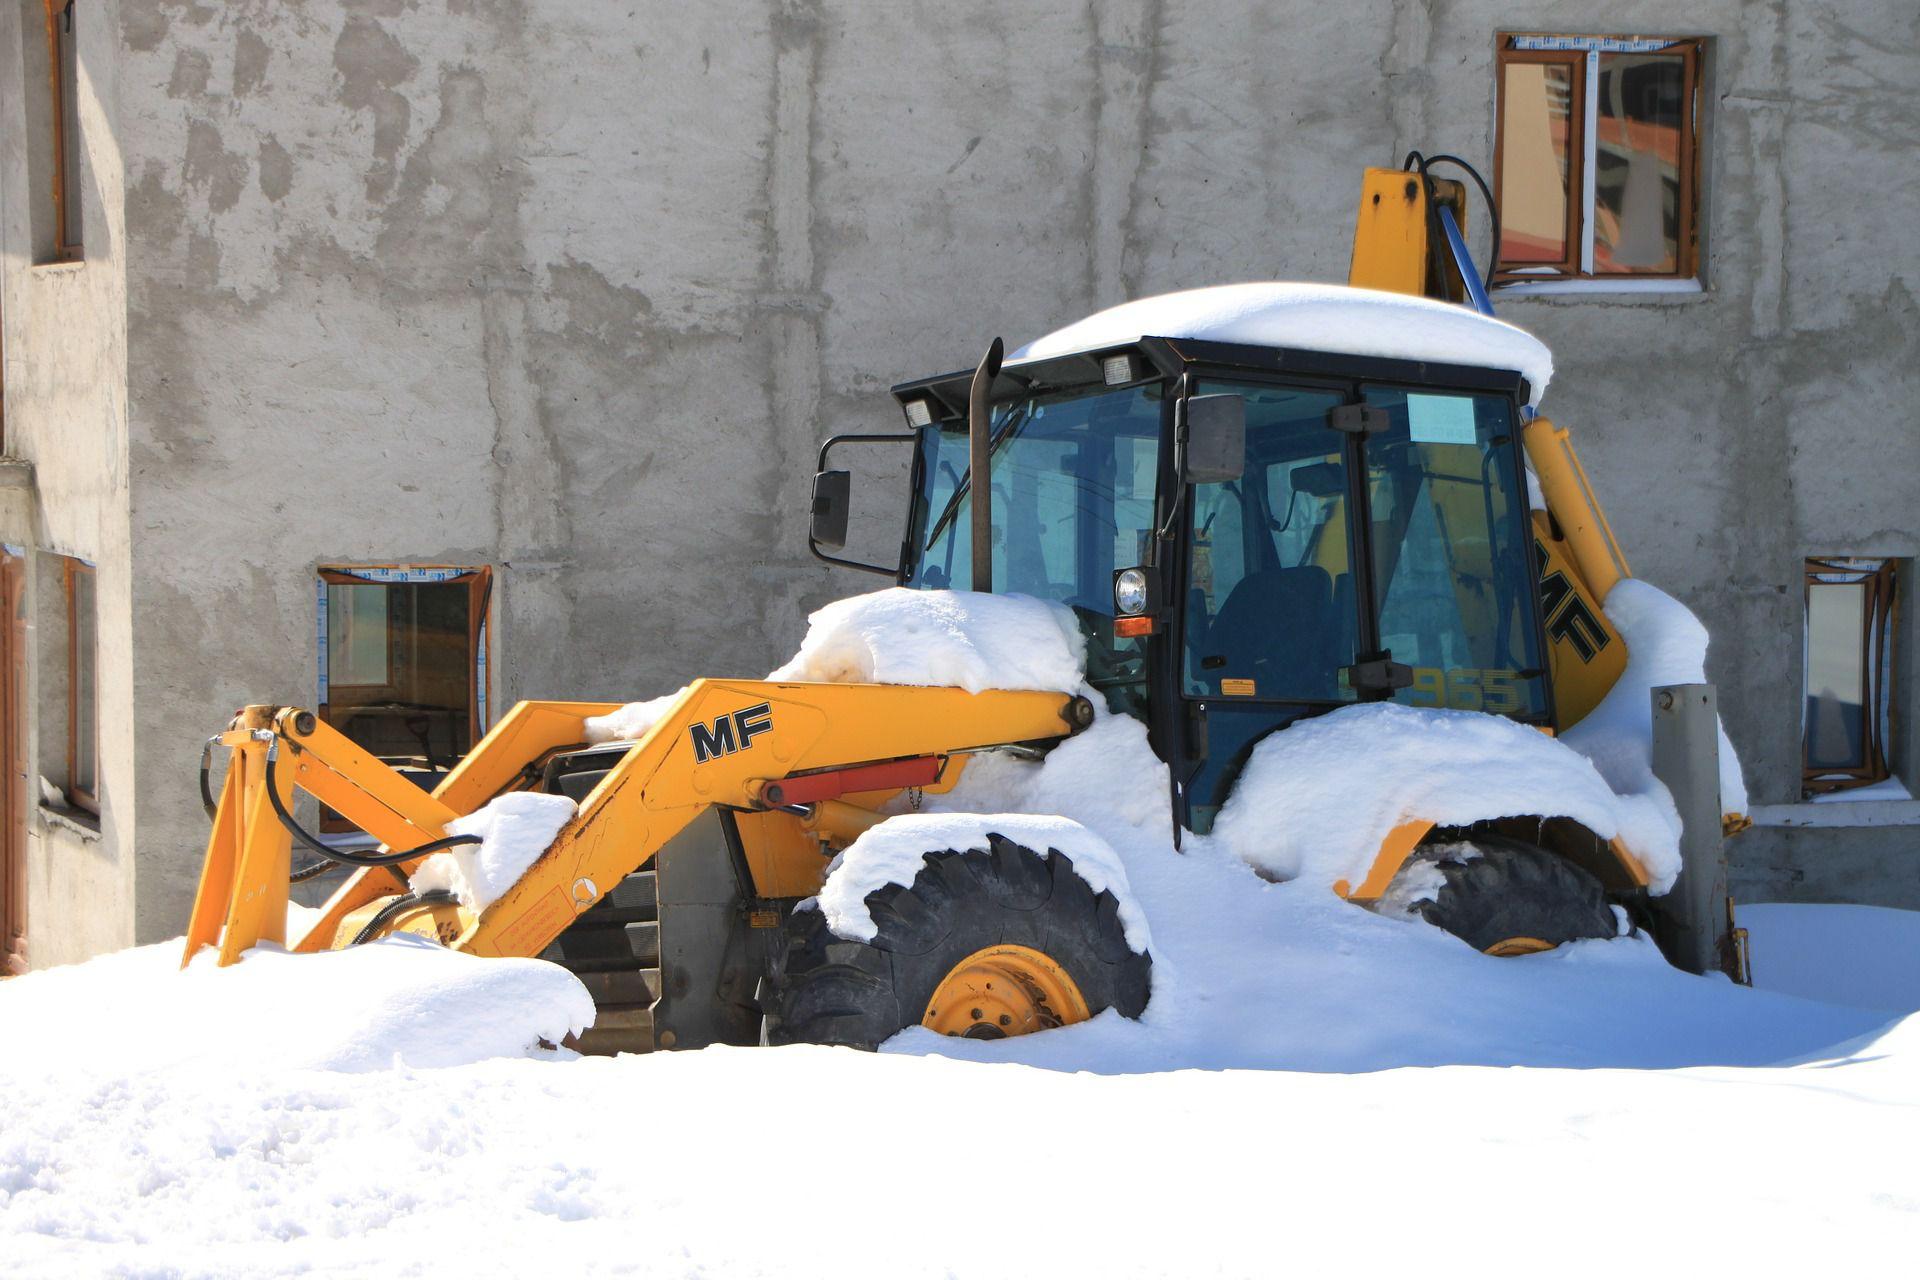 Tiny Home Designs: Construction Equipment Winter Care Maintenance Tips